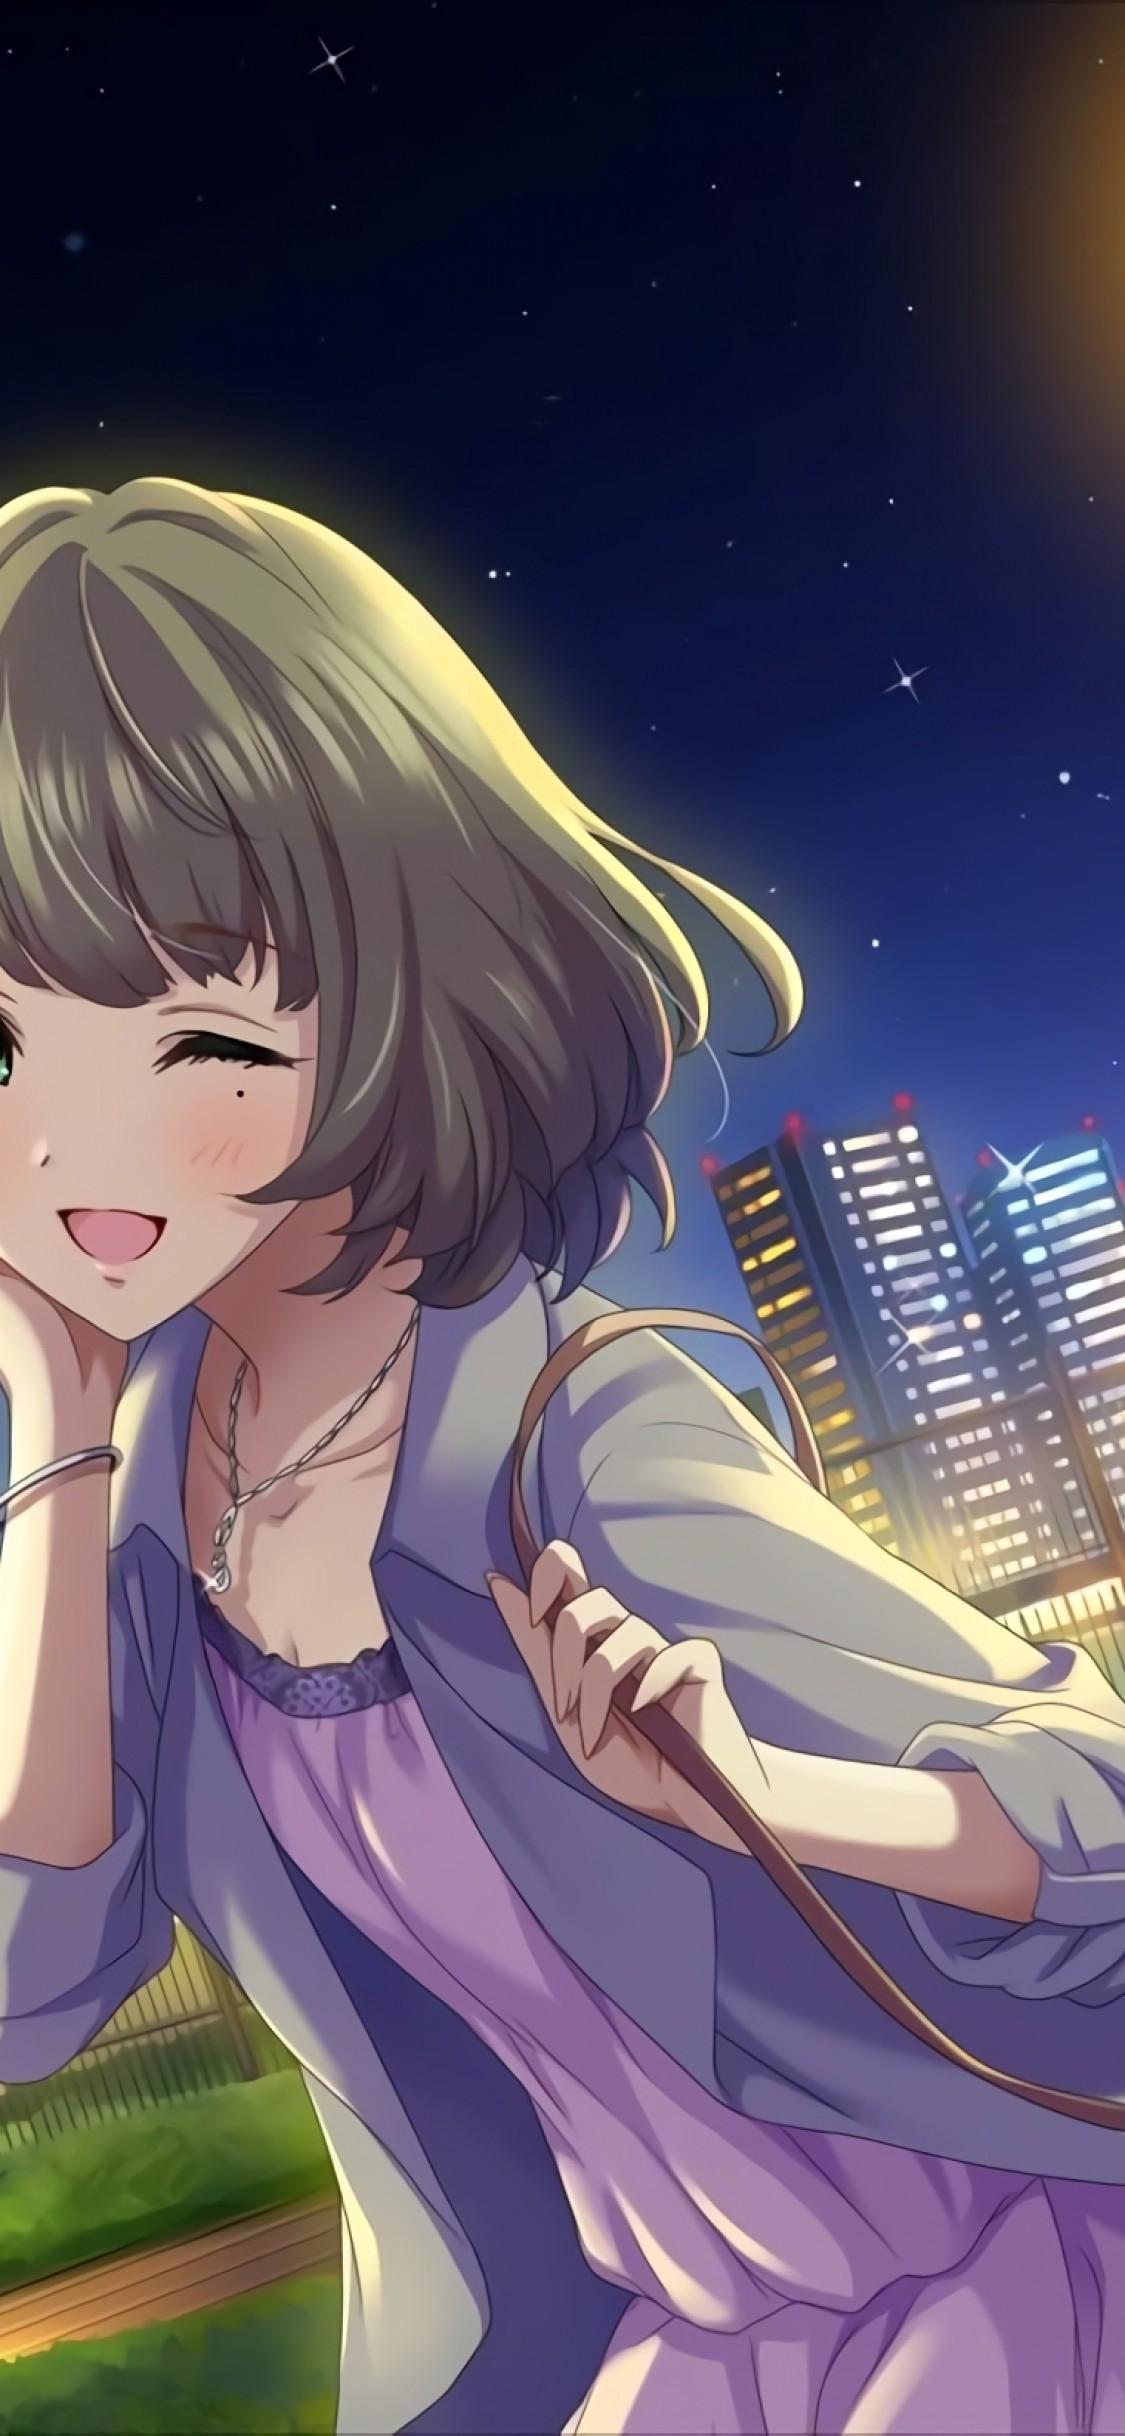 Sad Boy And Girl Full Hd Wallpaper صور انمي خلفيات رائعة لهواتف الآيفون Iphone X Anime عالم